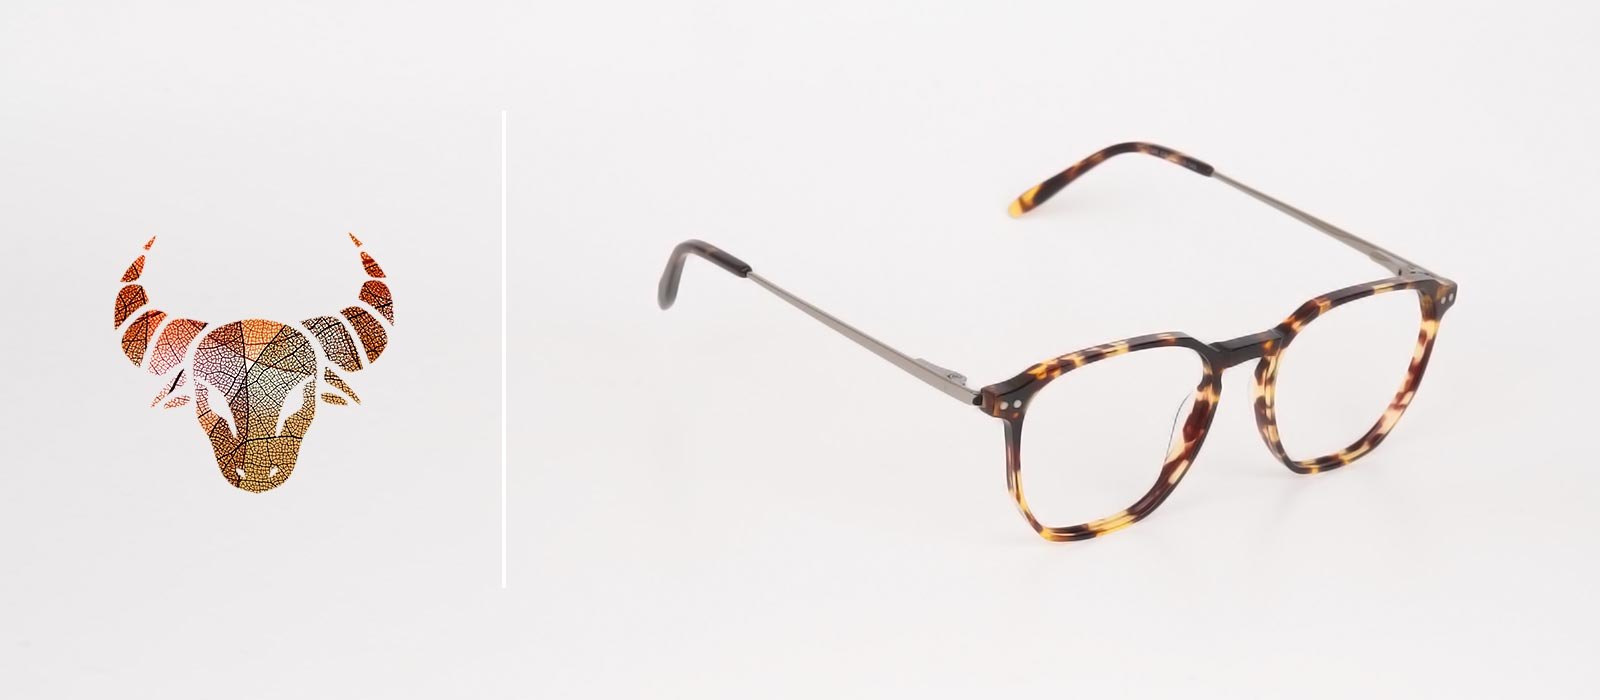 eyewear trend 2019 according tauras zodiac sign